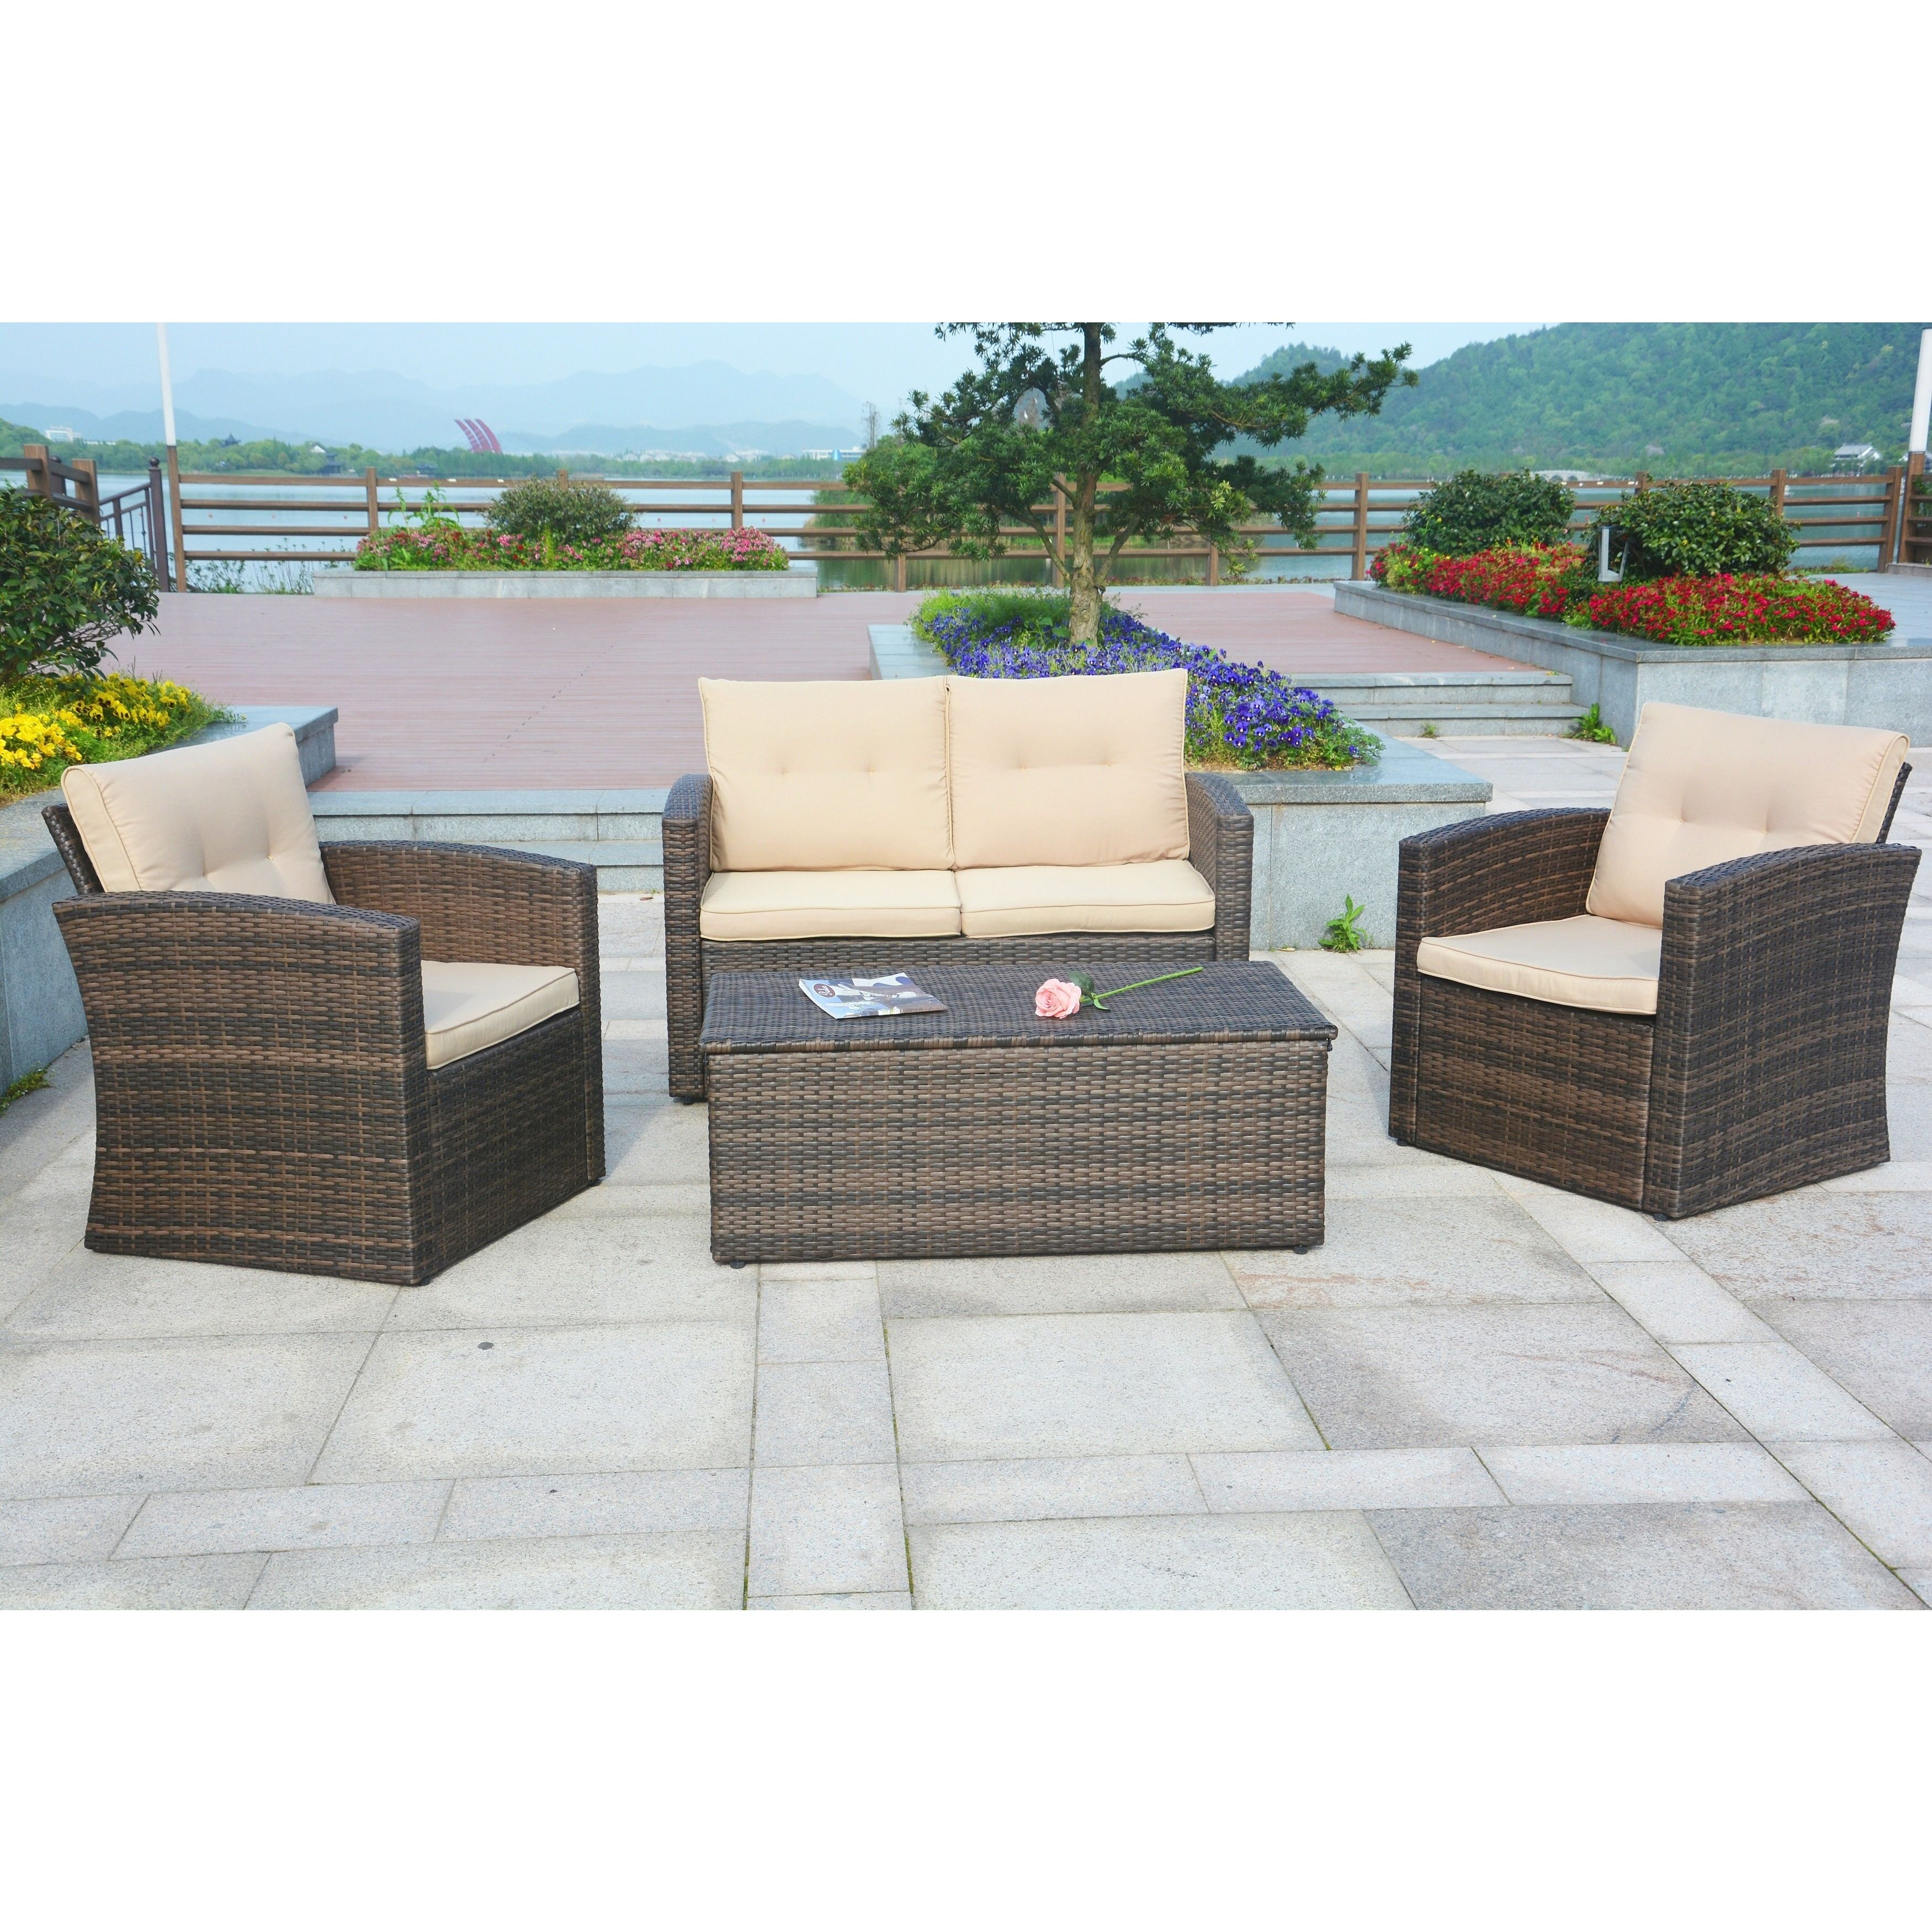 03d6bf1fc89215e74389f7f206ff947a Top Result 50 New Patio Furniture Plus Picture 2017 Hyt4